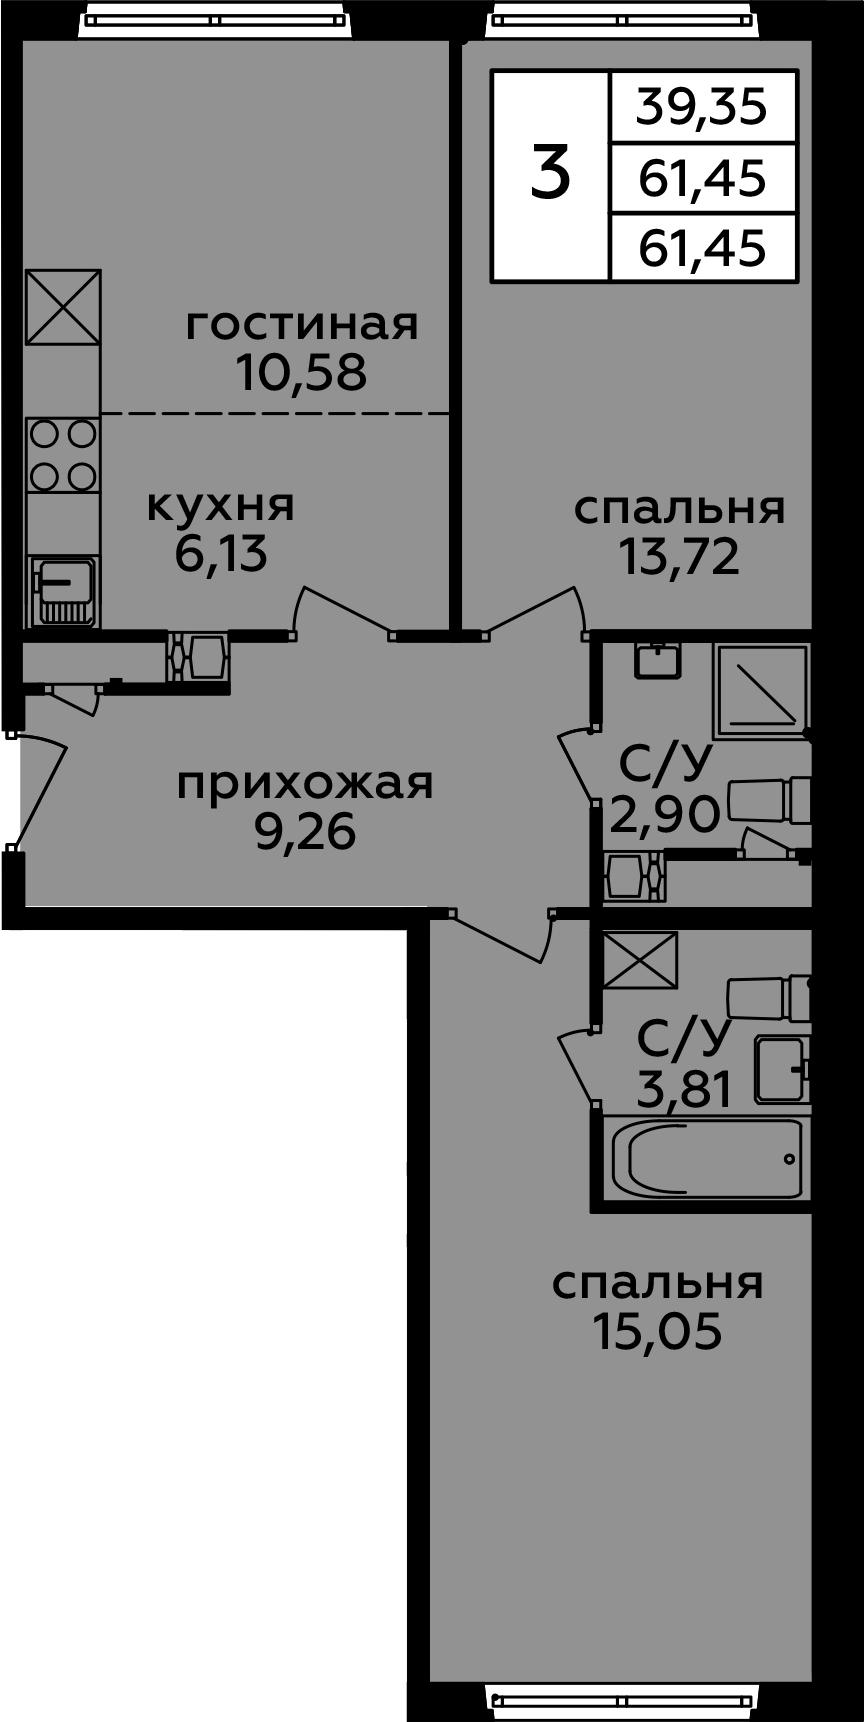 3Е-к.кв, 61.45 м²